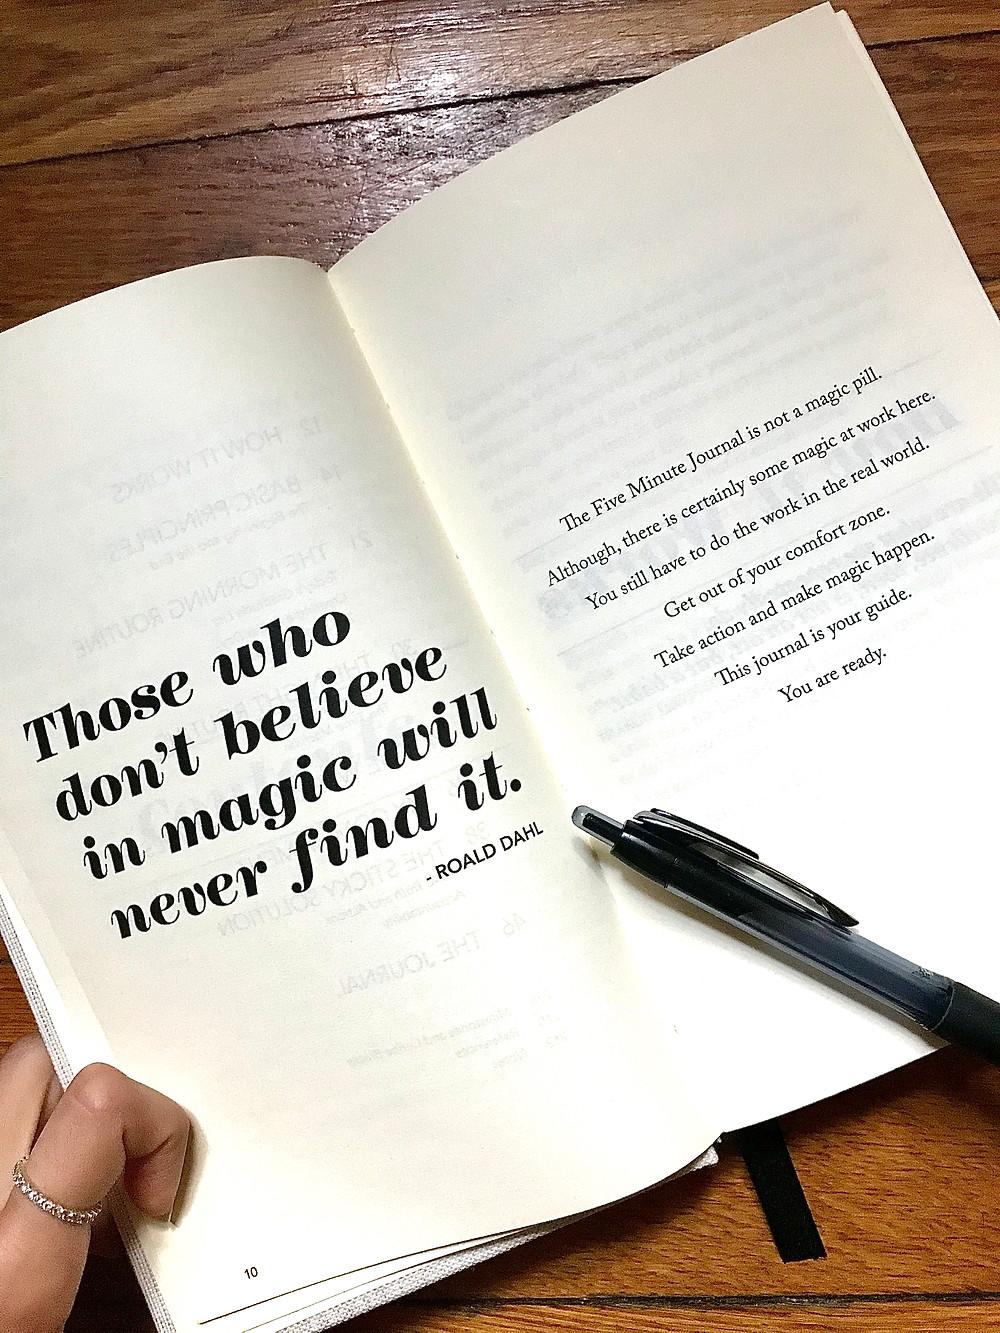 The Five Minute Journal Review. Gratitude Journal, Affirmation Journal.